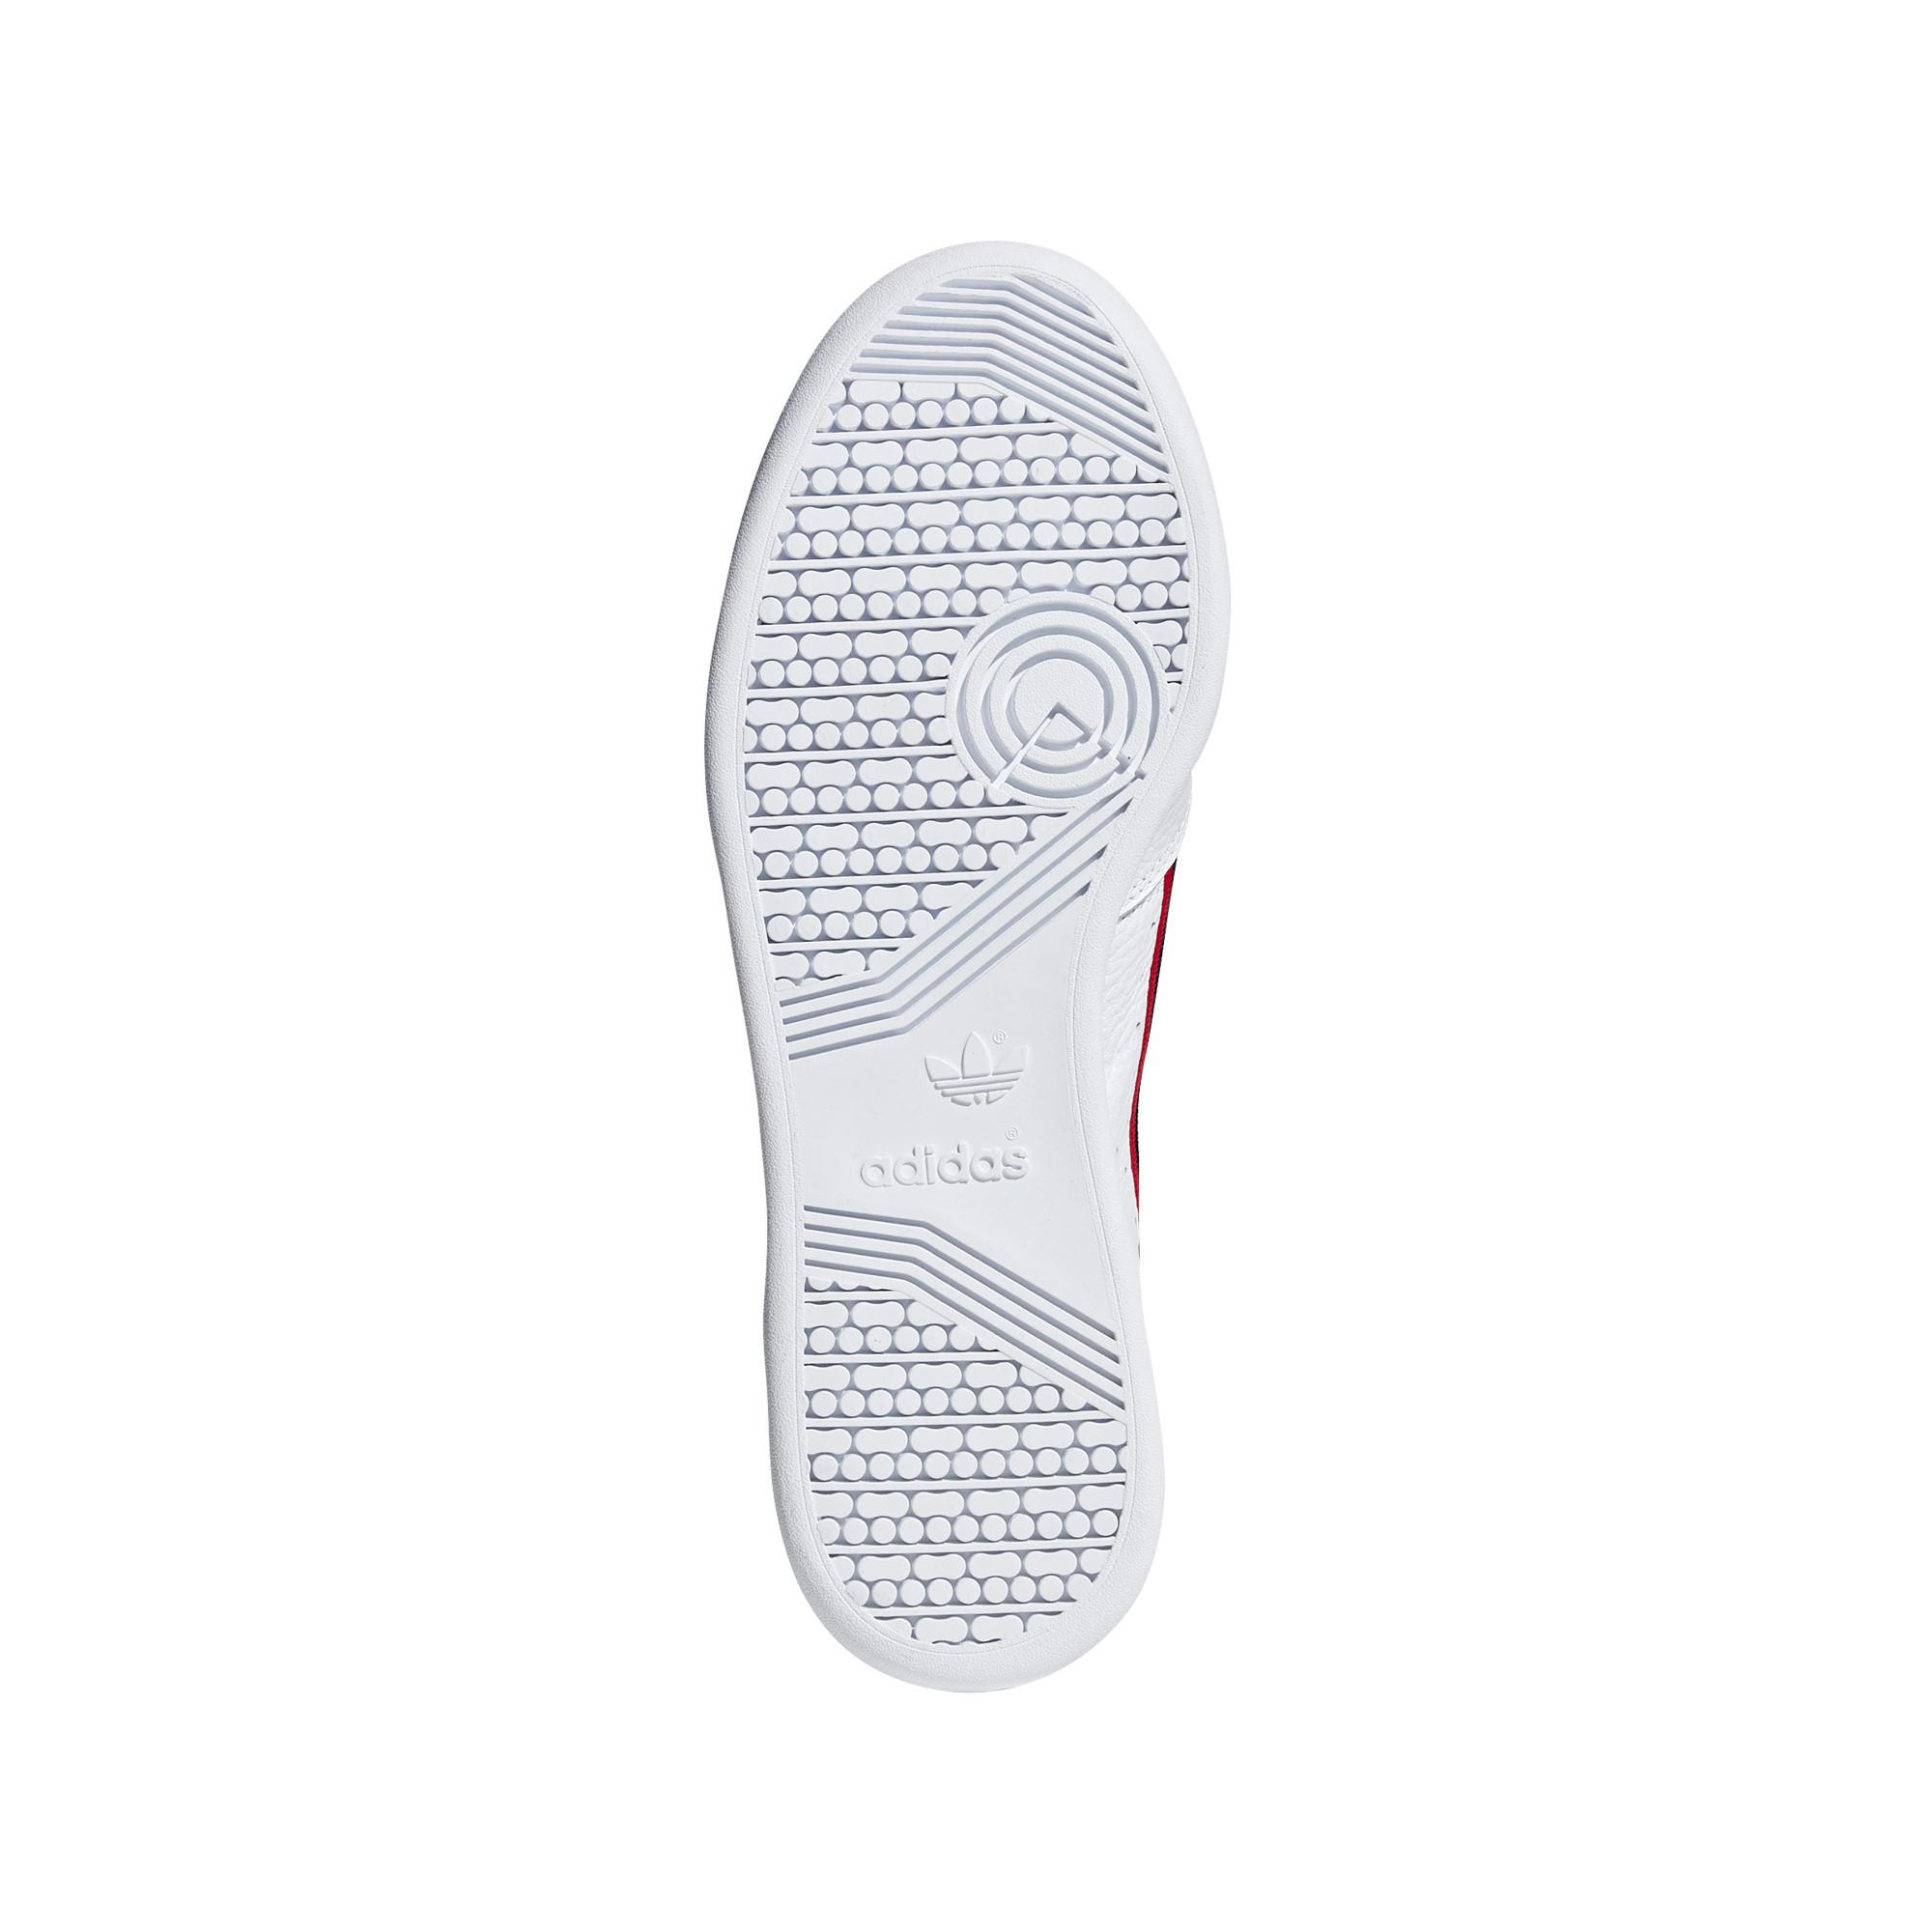 Scarpe uomo Continental 80, Bianco, large image number 6